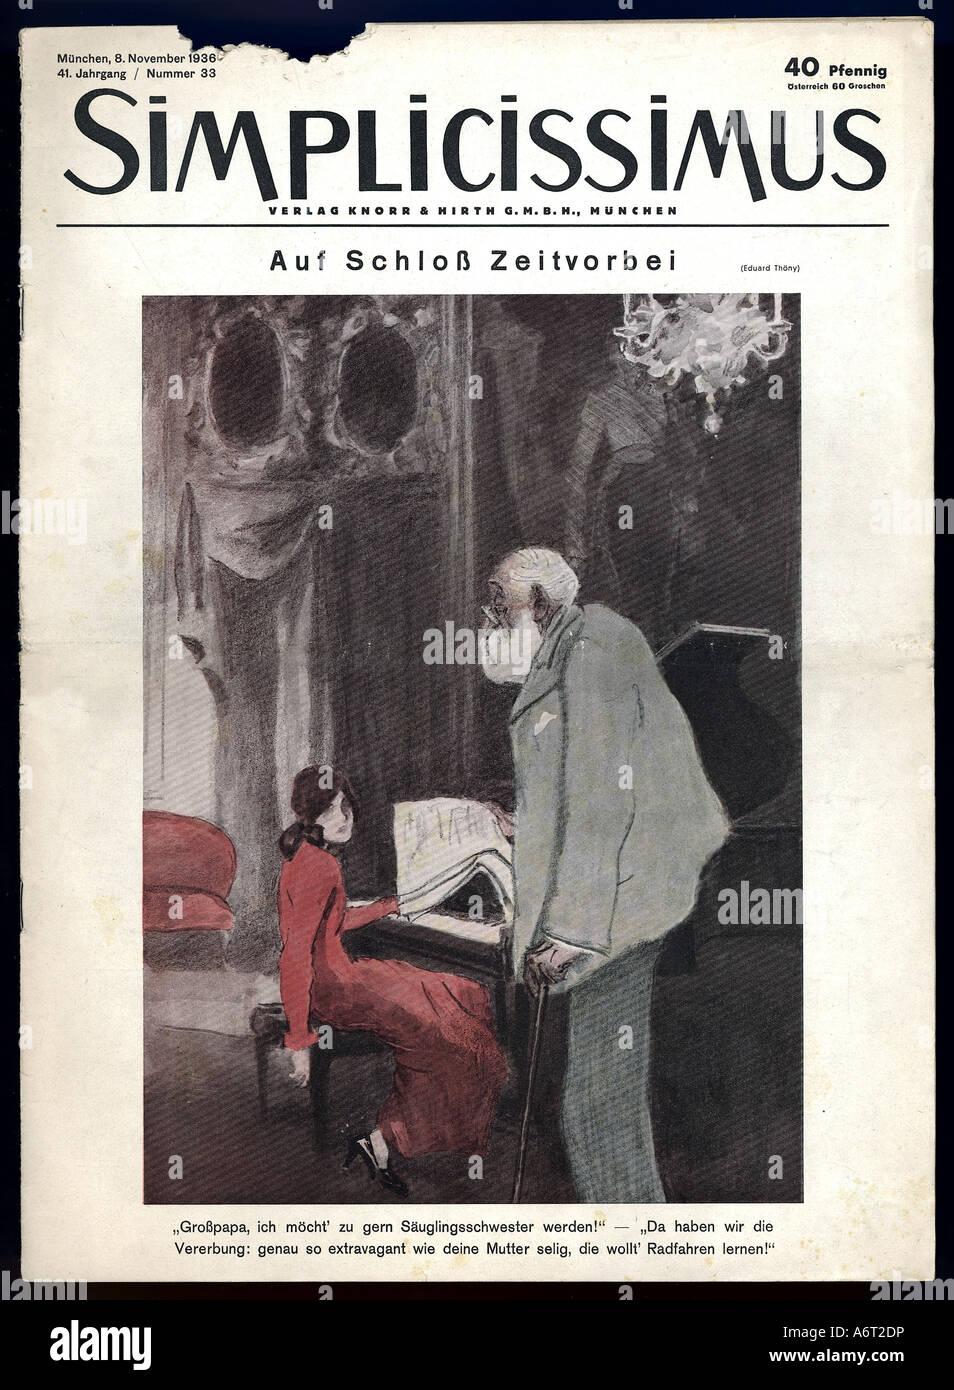 press/media, magazines, 'Simplicissimus', Munich, 41st volume, number 33, 8.11.1936, title by Eduard Thöny, - Stock Image